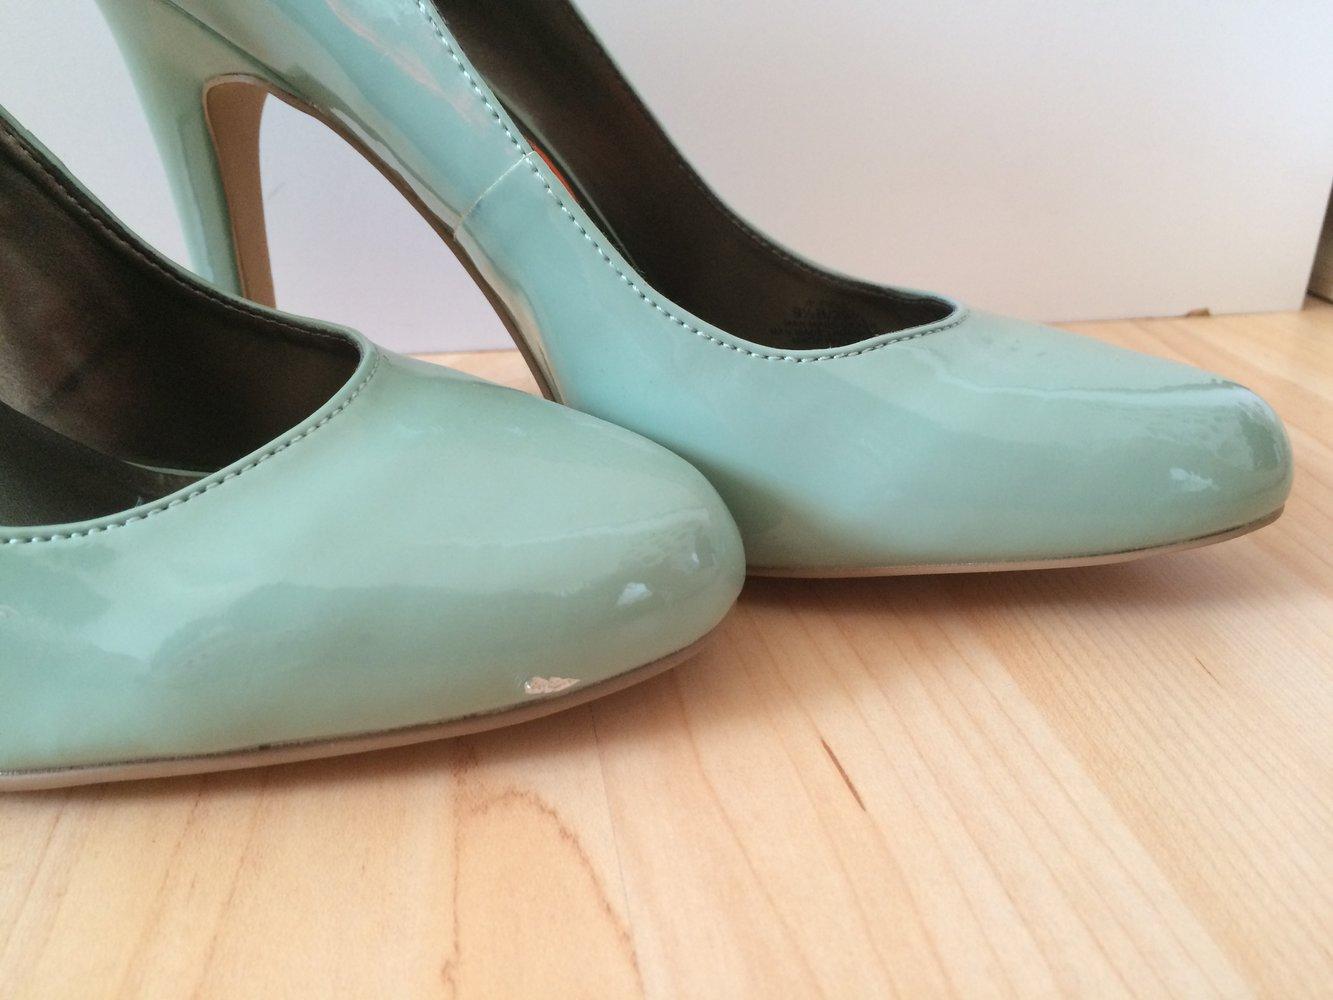 neu jessica simpson high heels gr e 39 1 2 9 1 2 farbe mintgr n. Black Bedroom Furniture Sets. Home Design Ideas